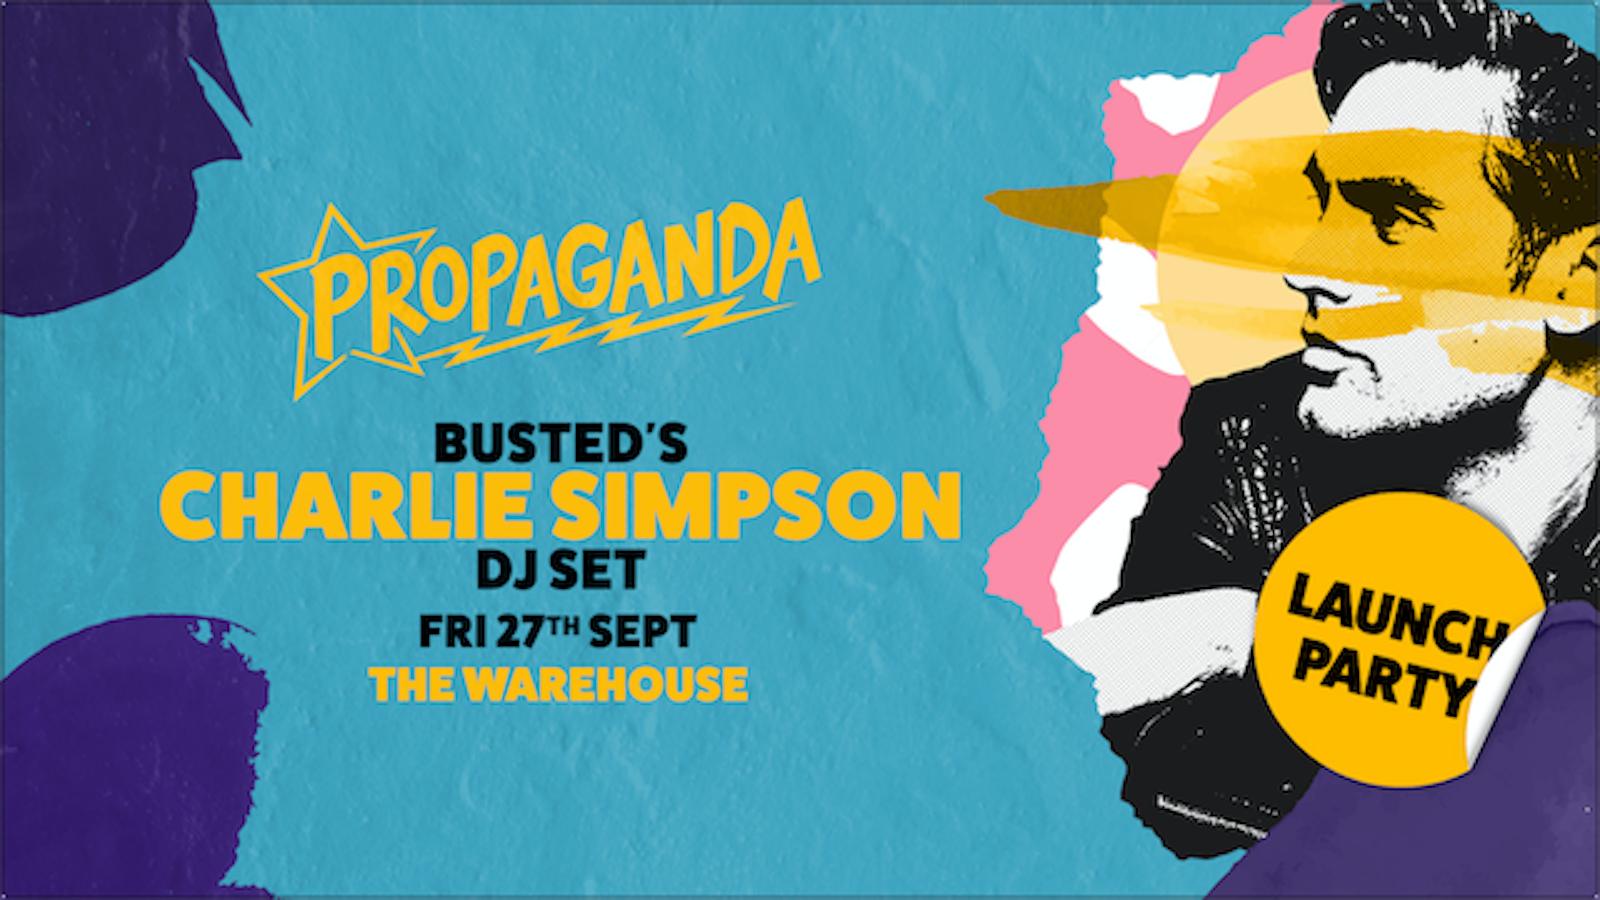 Propaganda Leeds – Busted's Charlie Simpson DJ Set! *Now on Fridays*